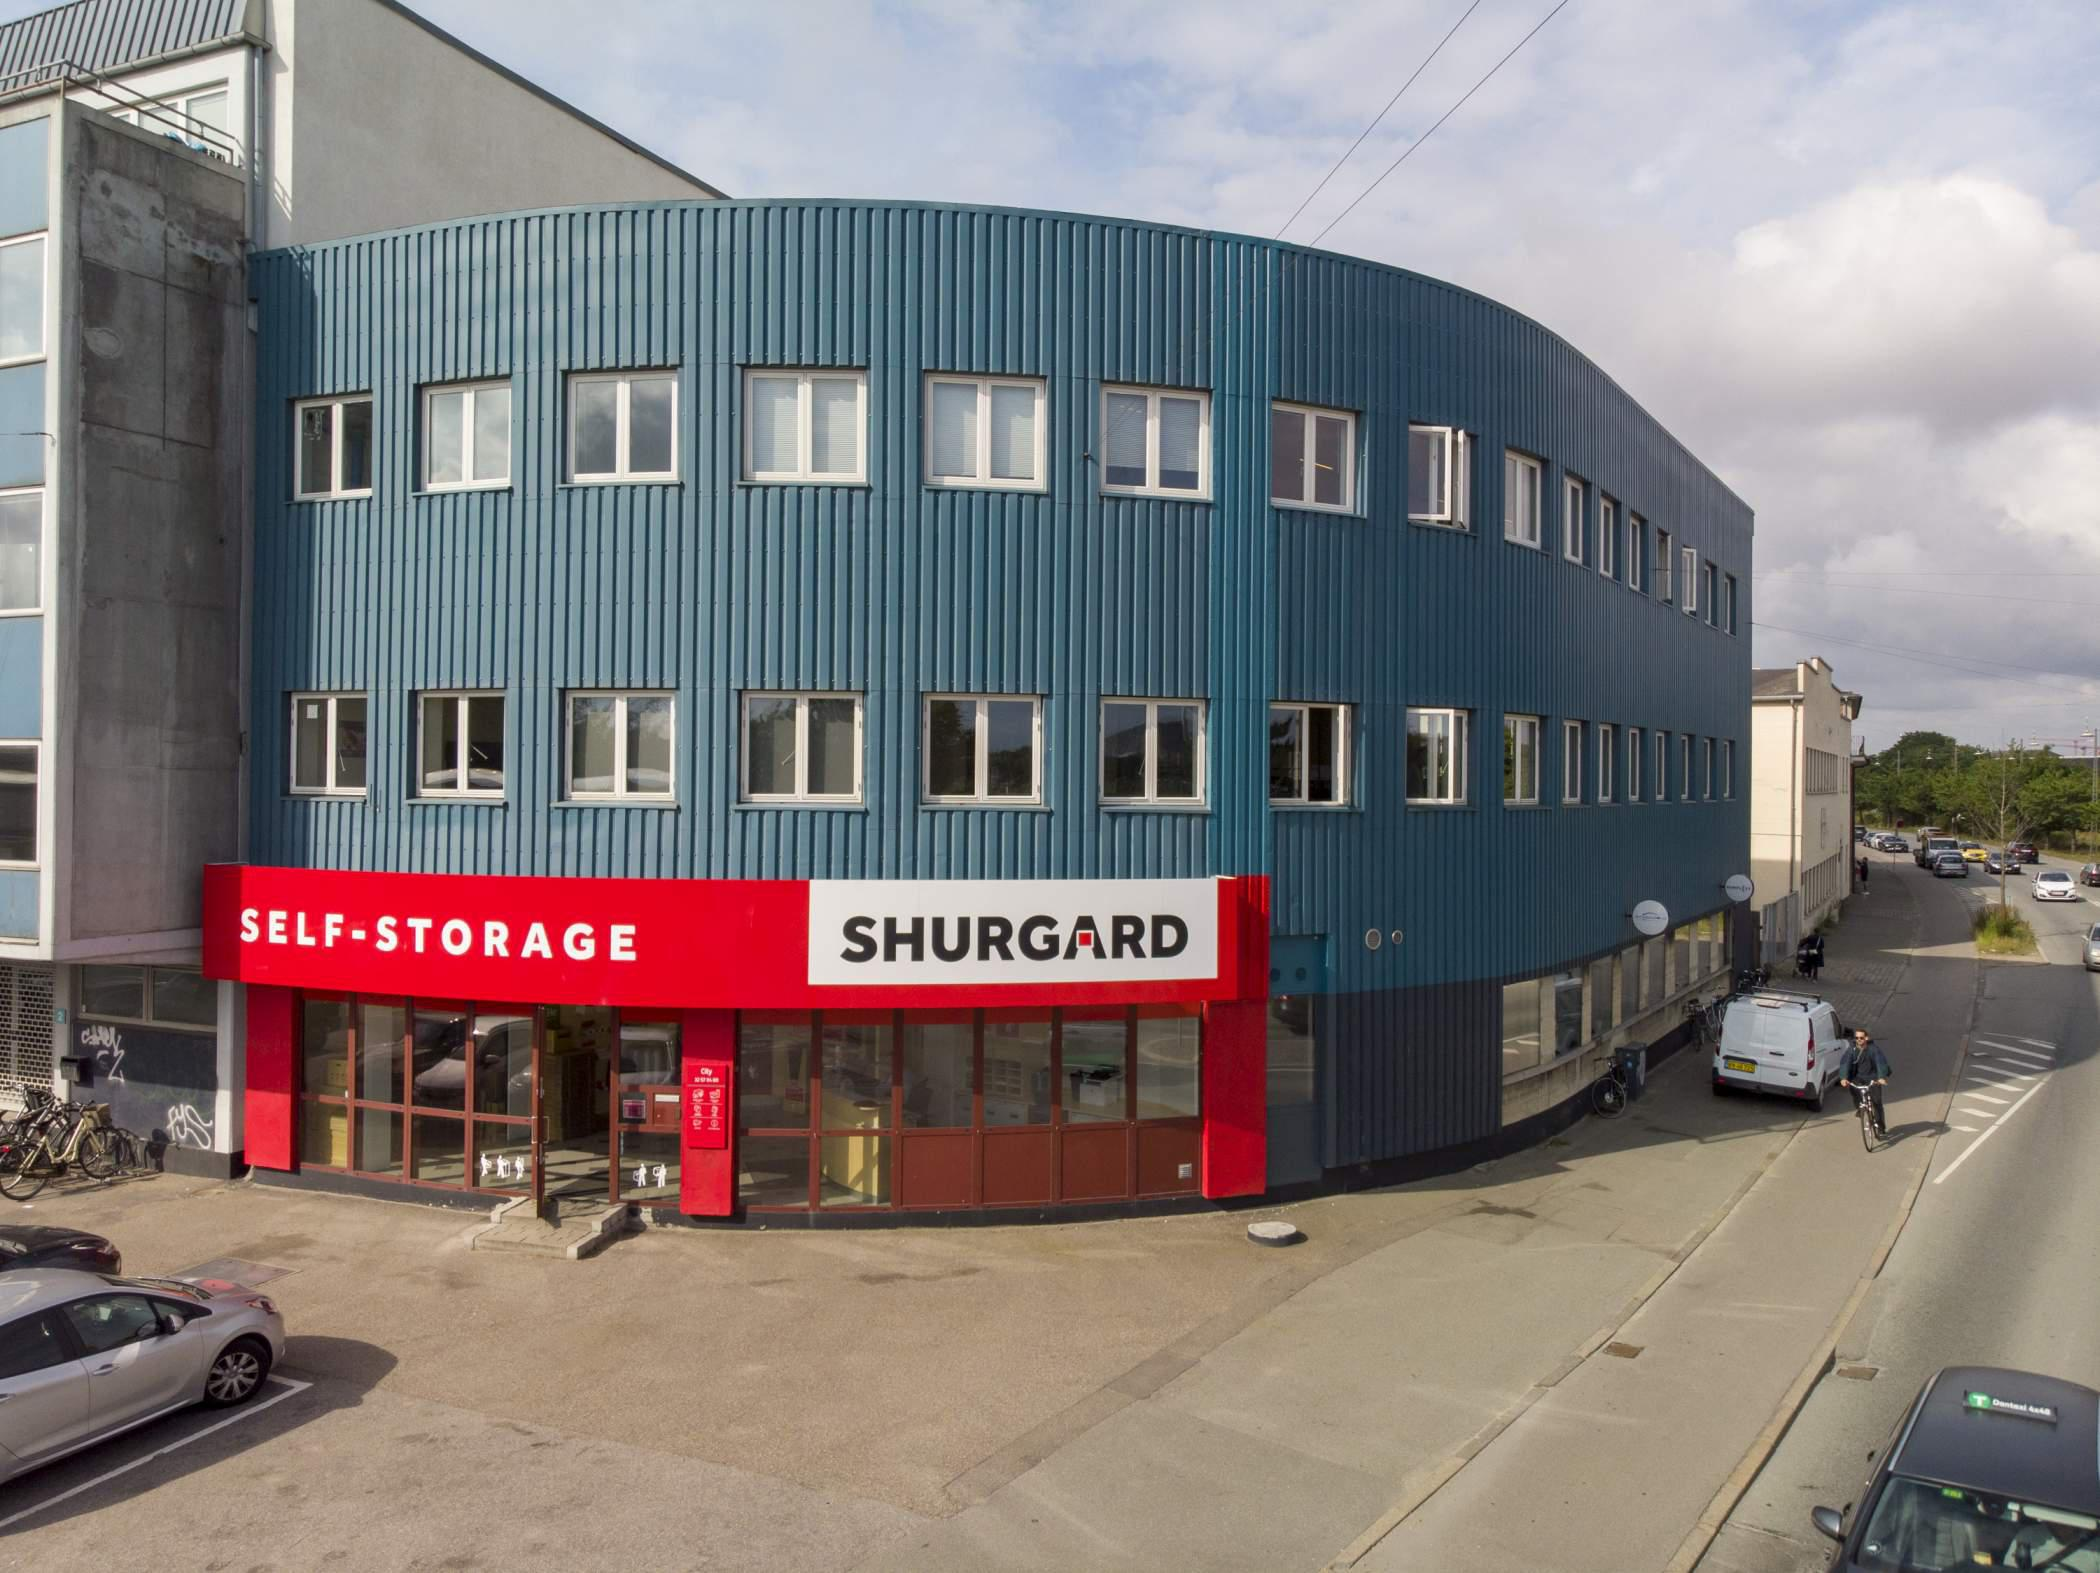 Shurgard Self-Storage City